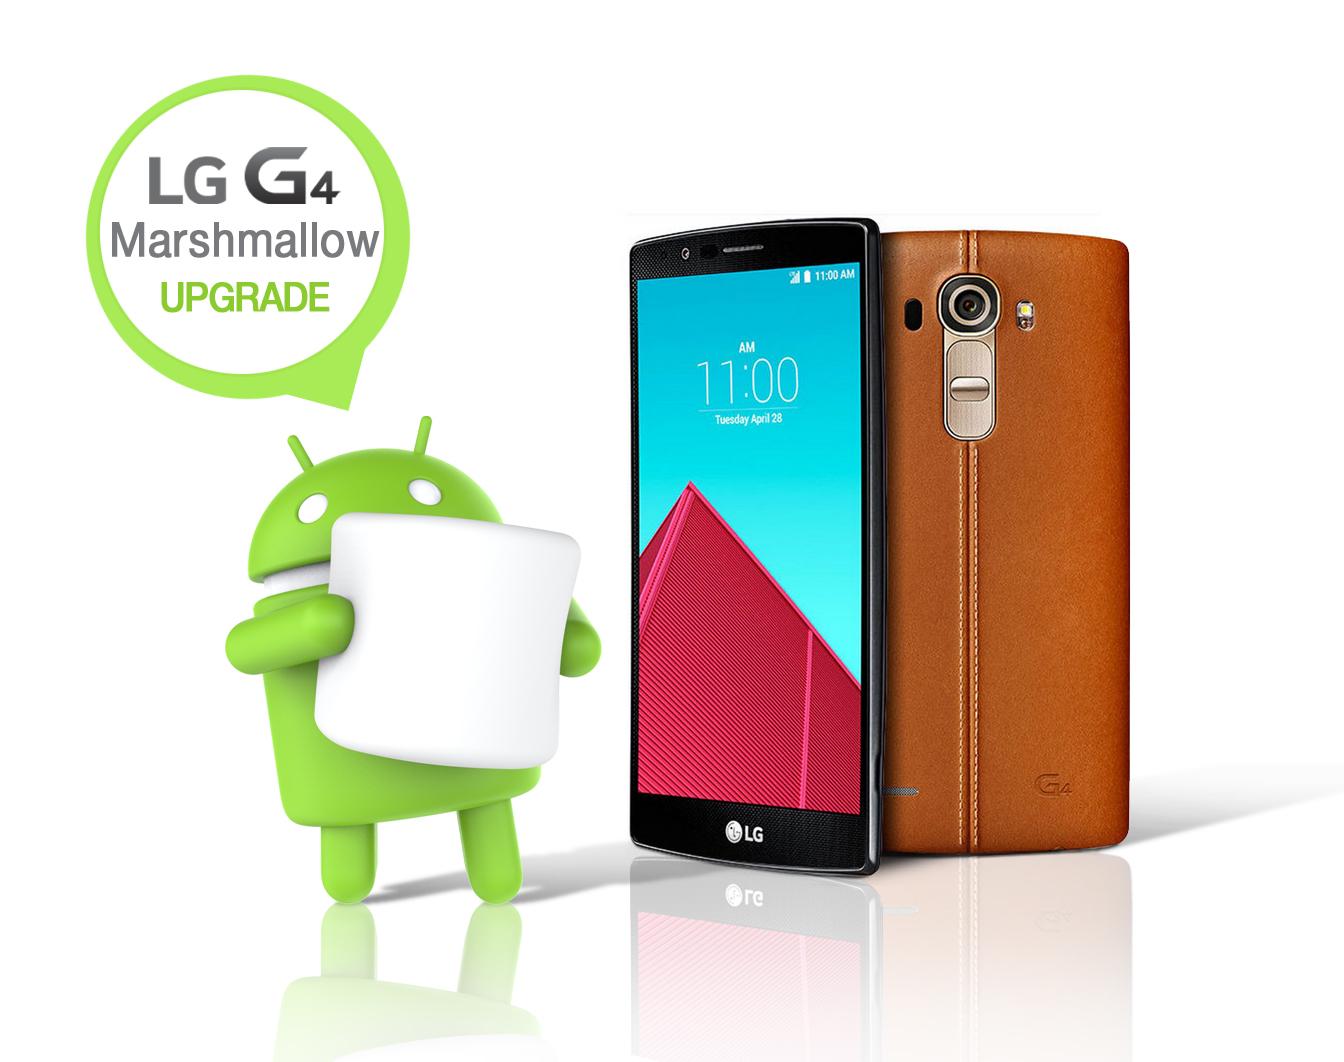 LG introduce noul Android 6.0 Marshmallow începând cu G4